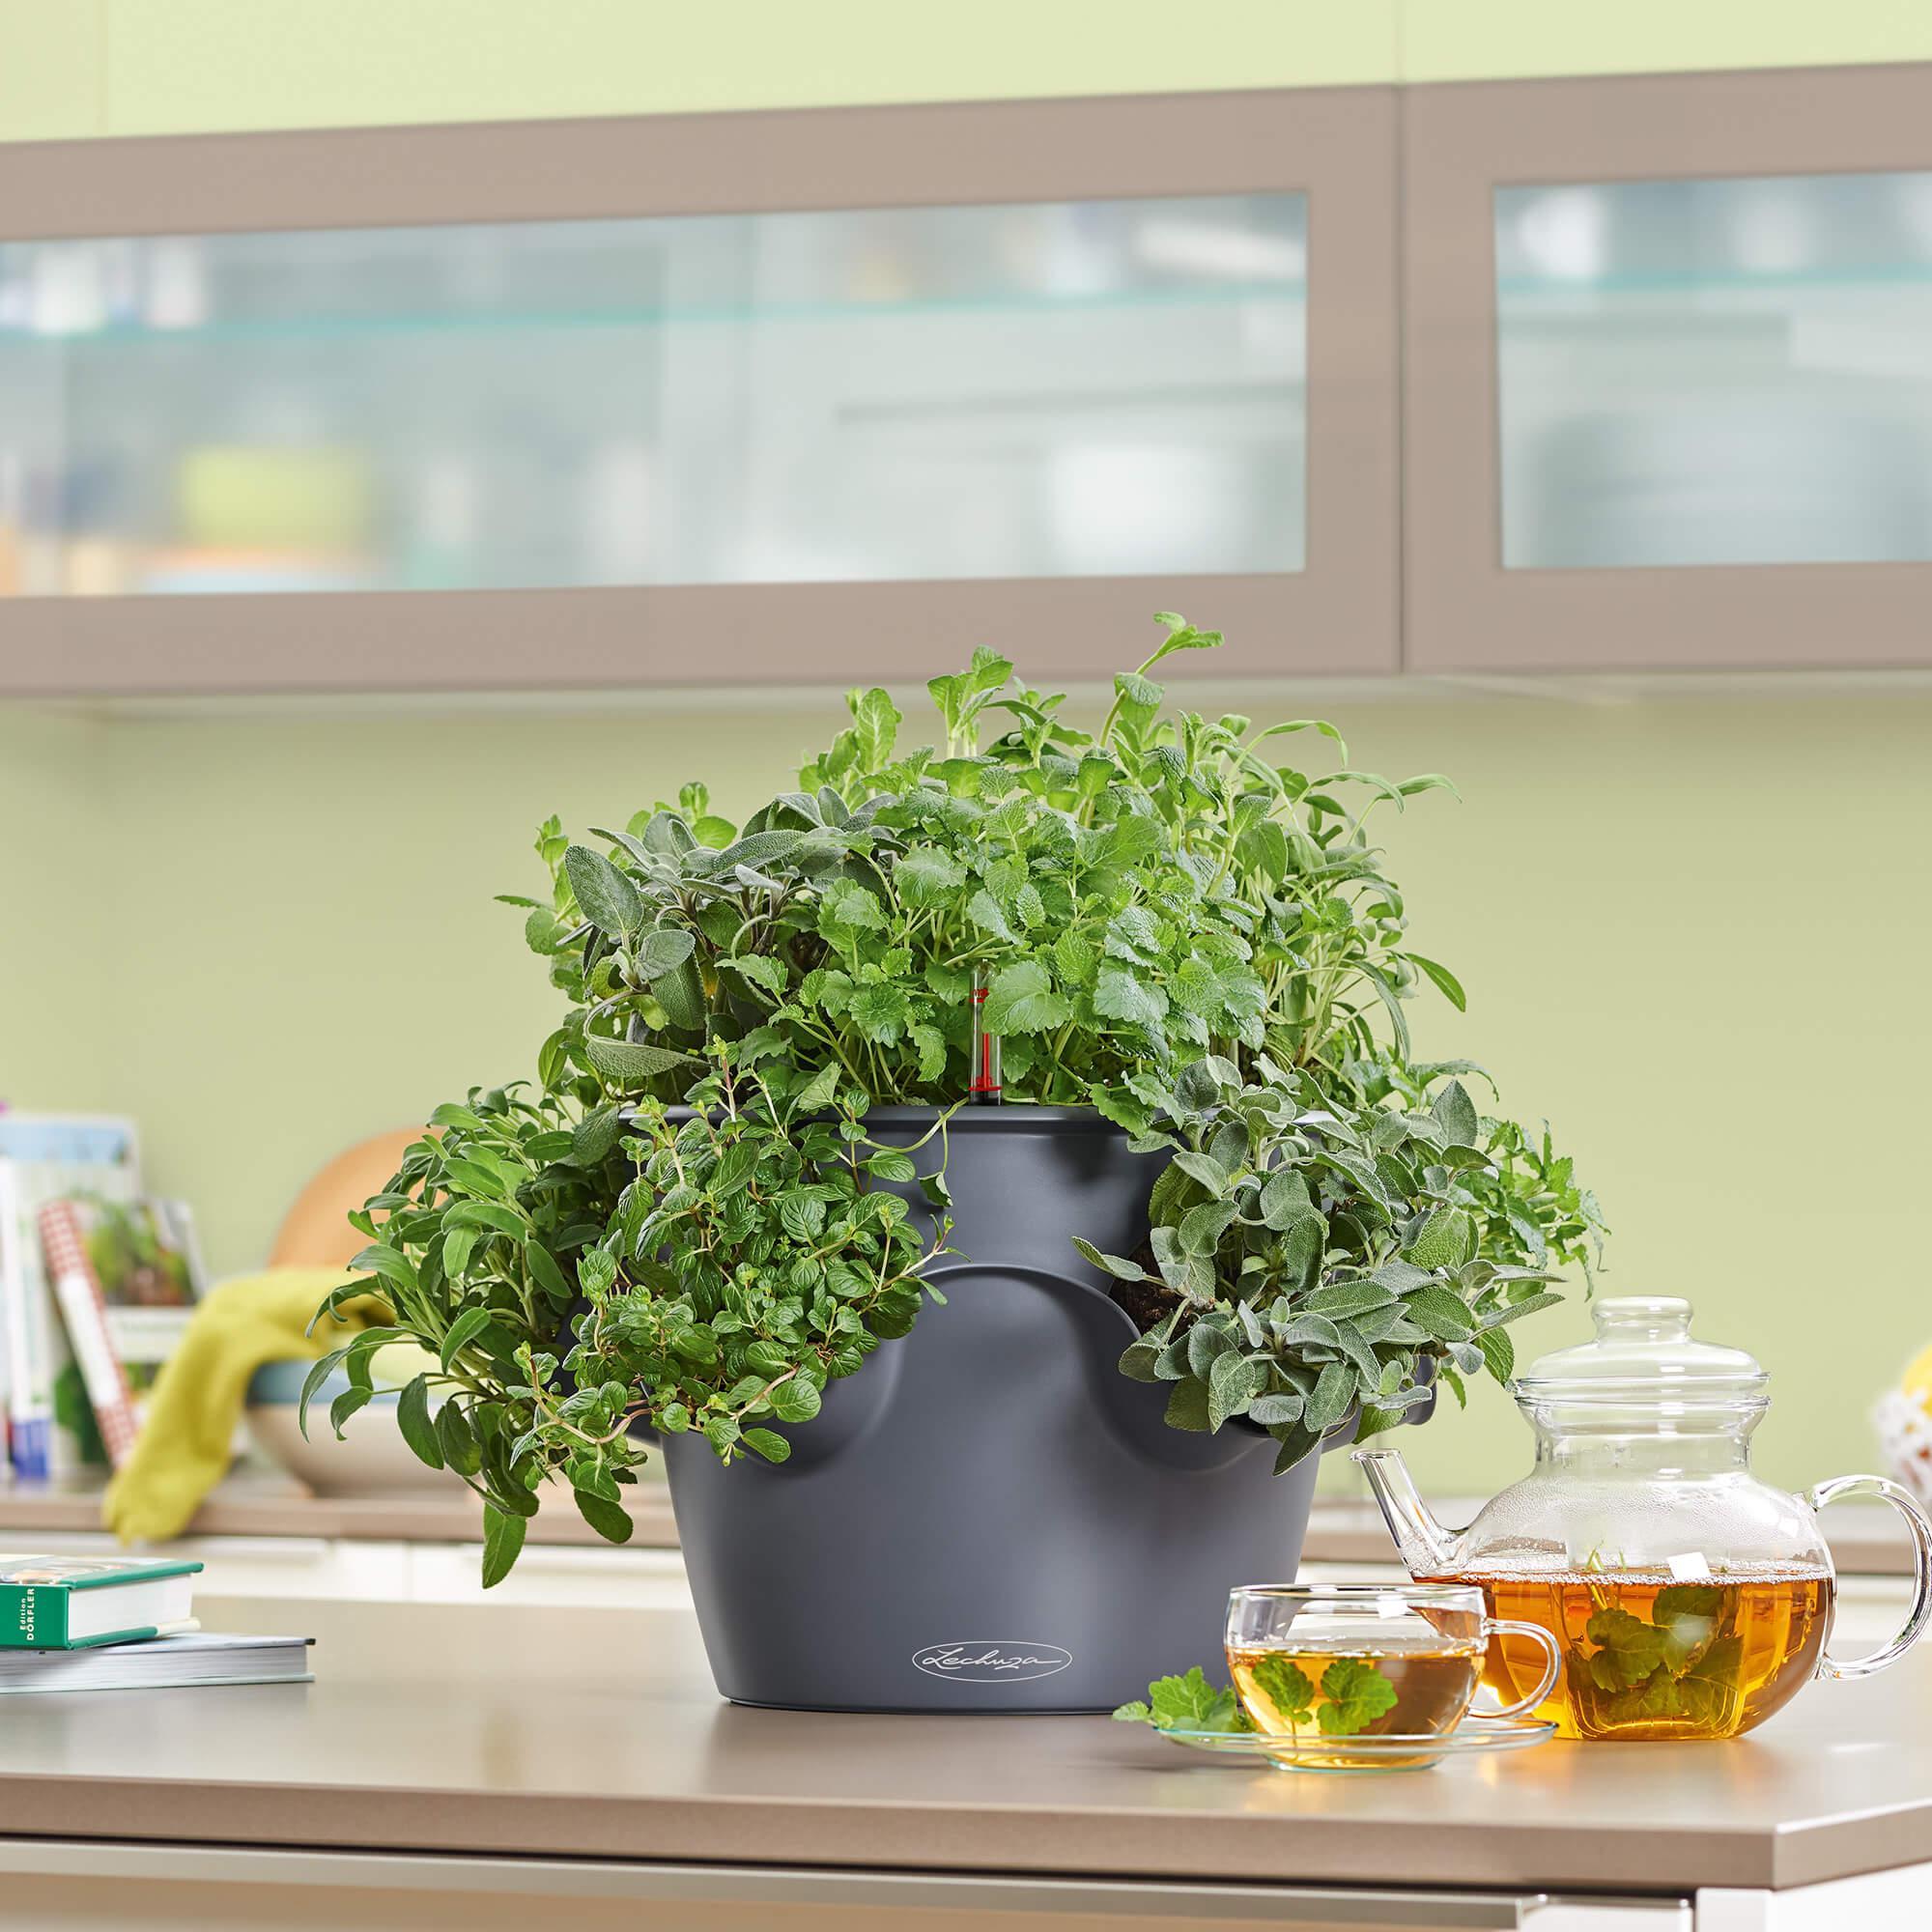 CASCADINO Color pistachio - Image 4